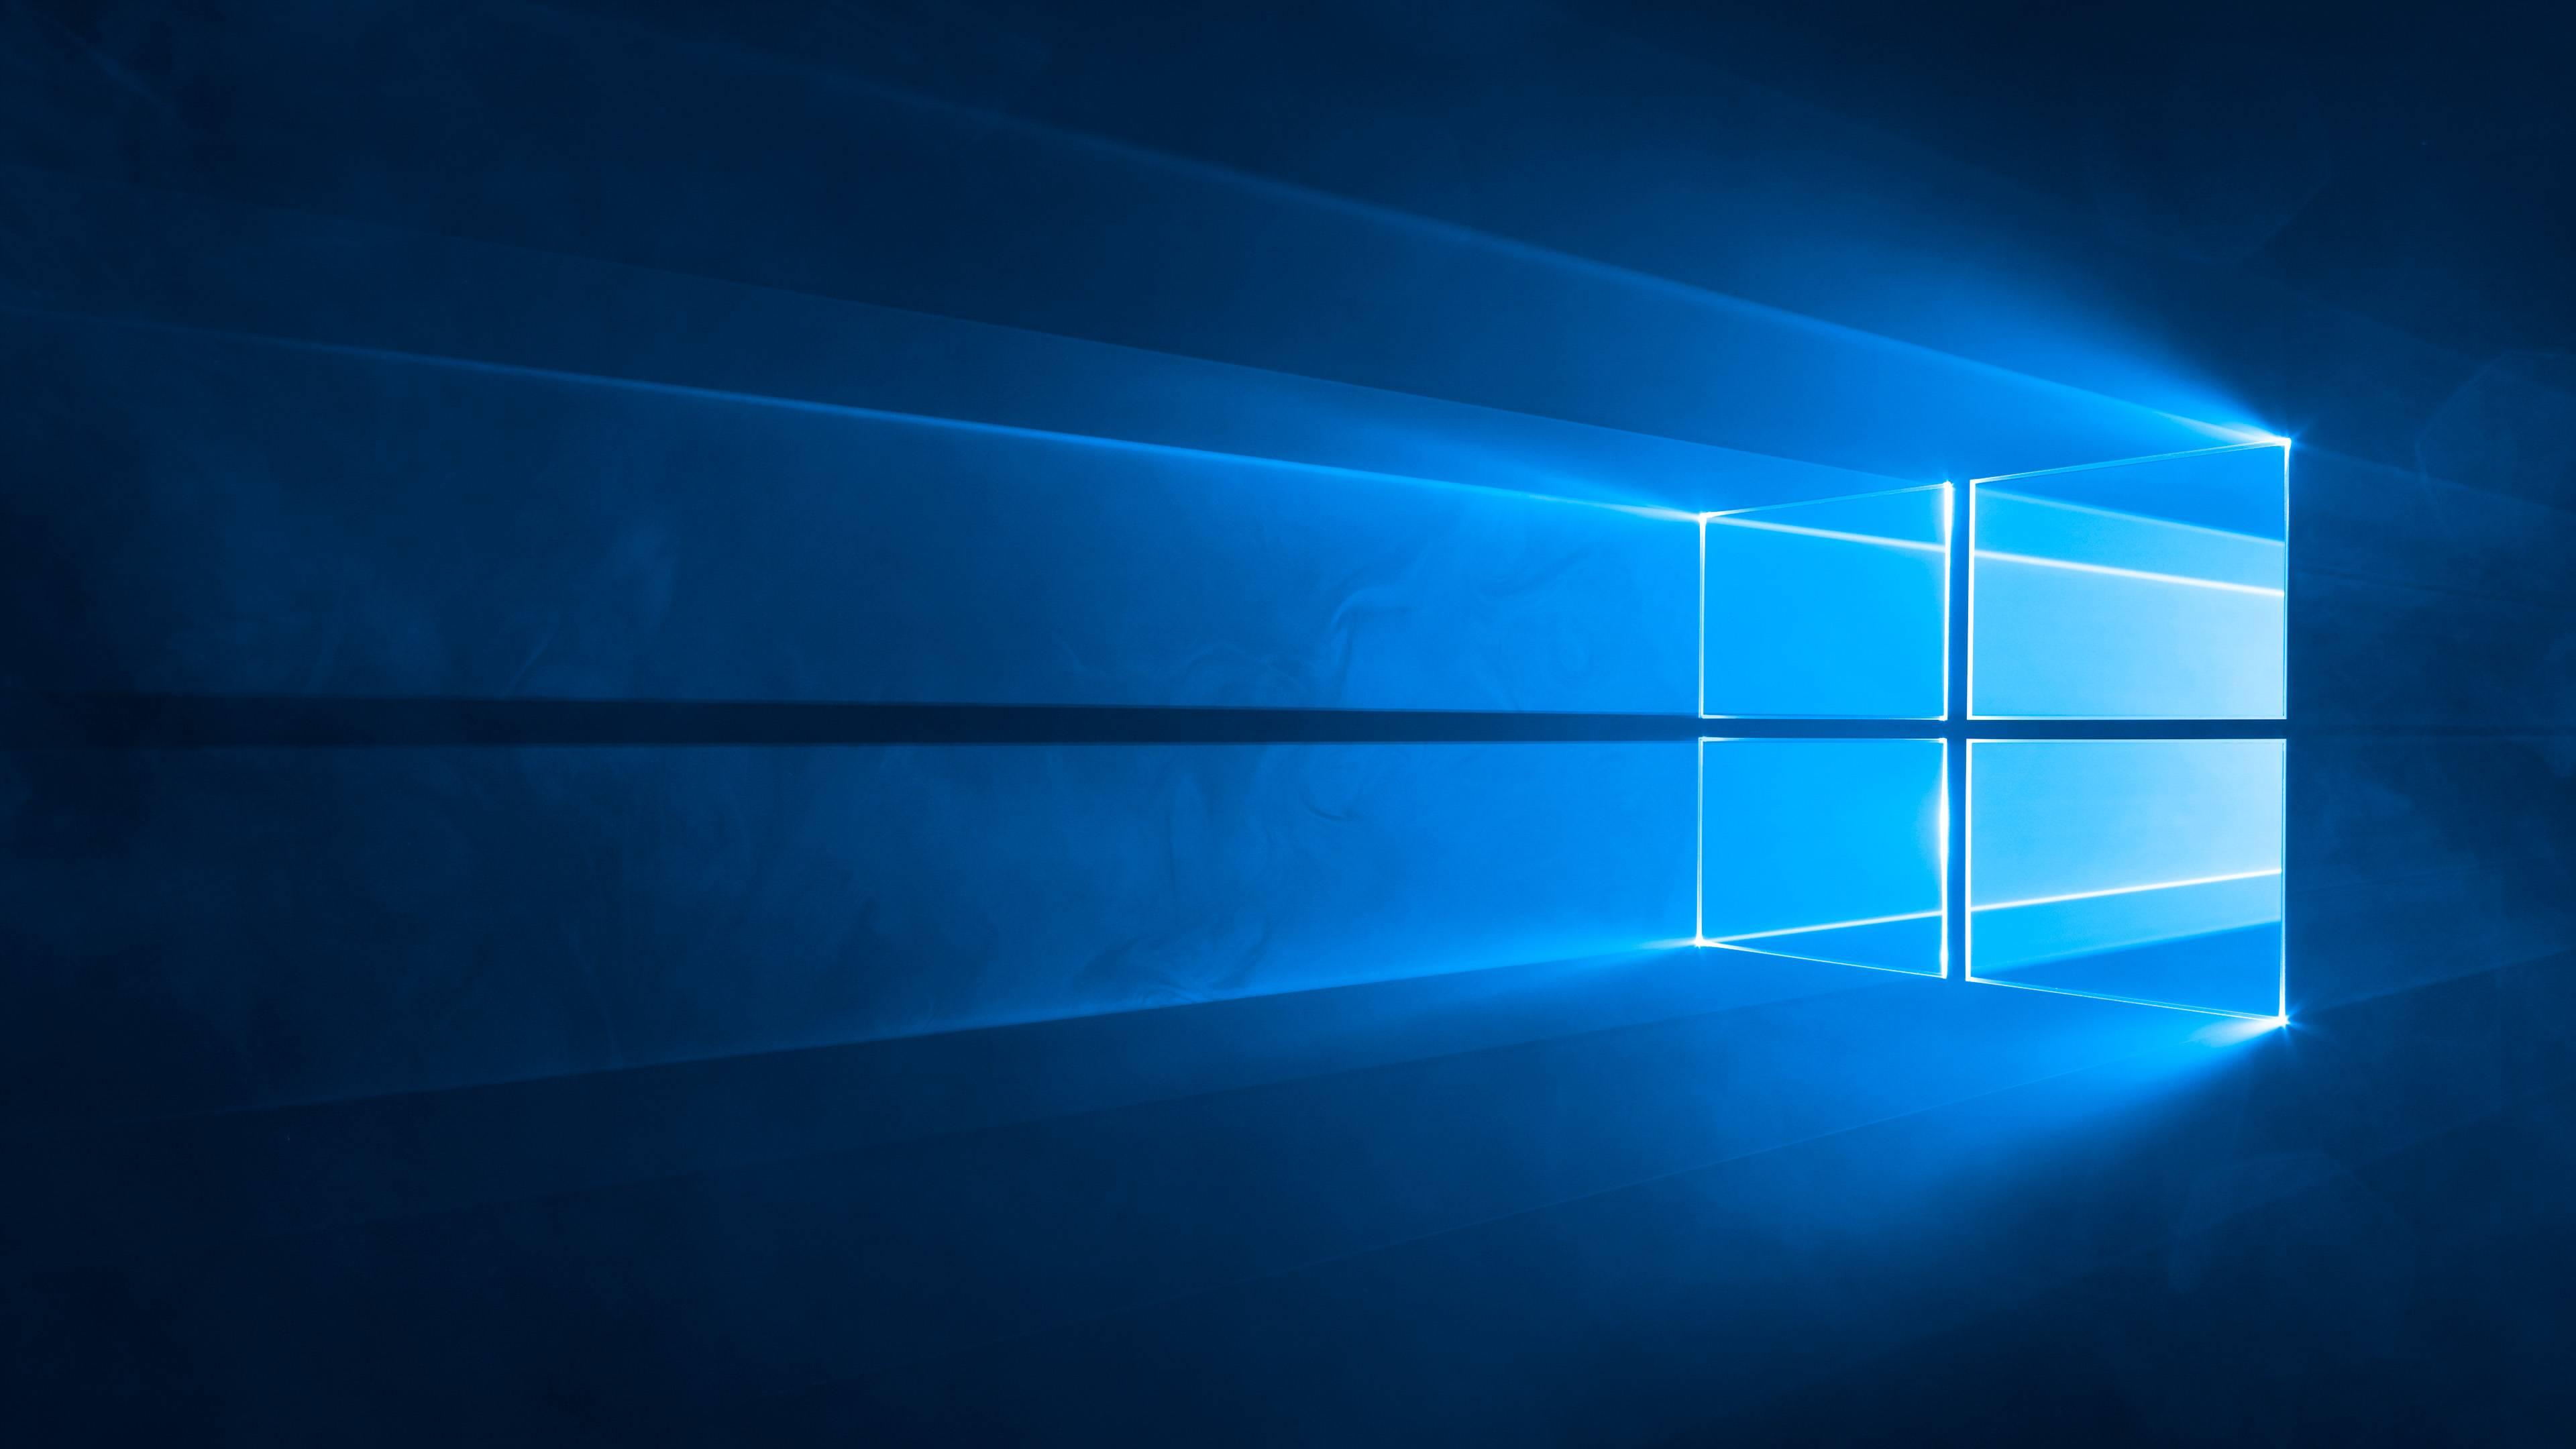 Windows 10 April 2018 Update— официальный анонс отMicrosoft